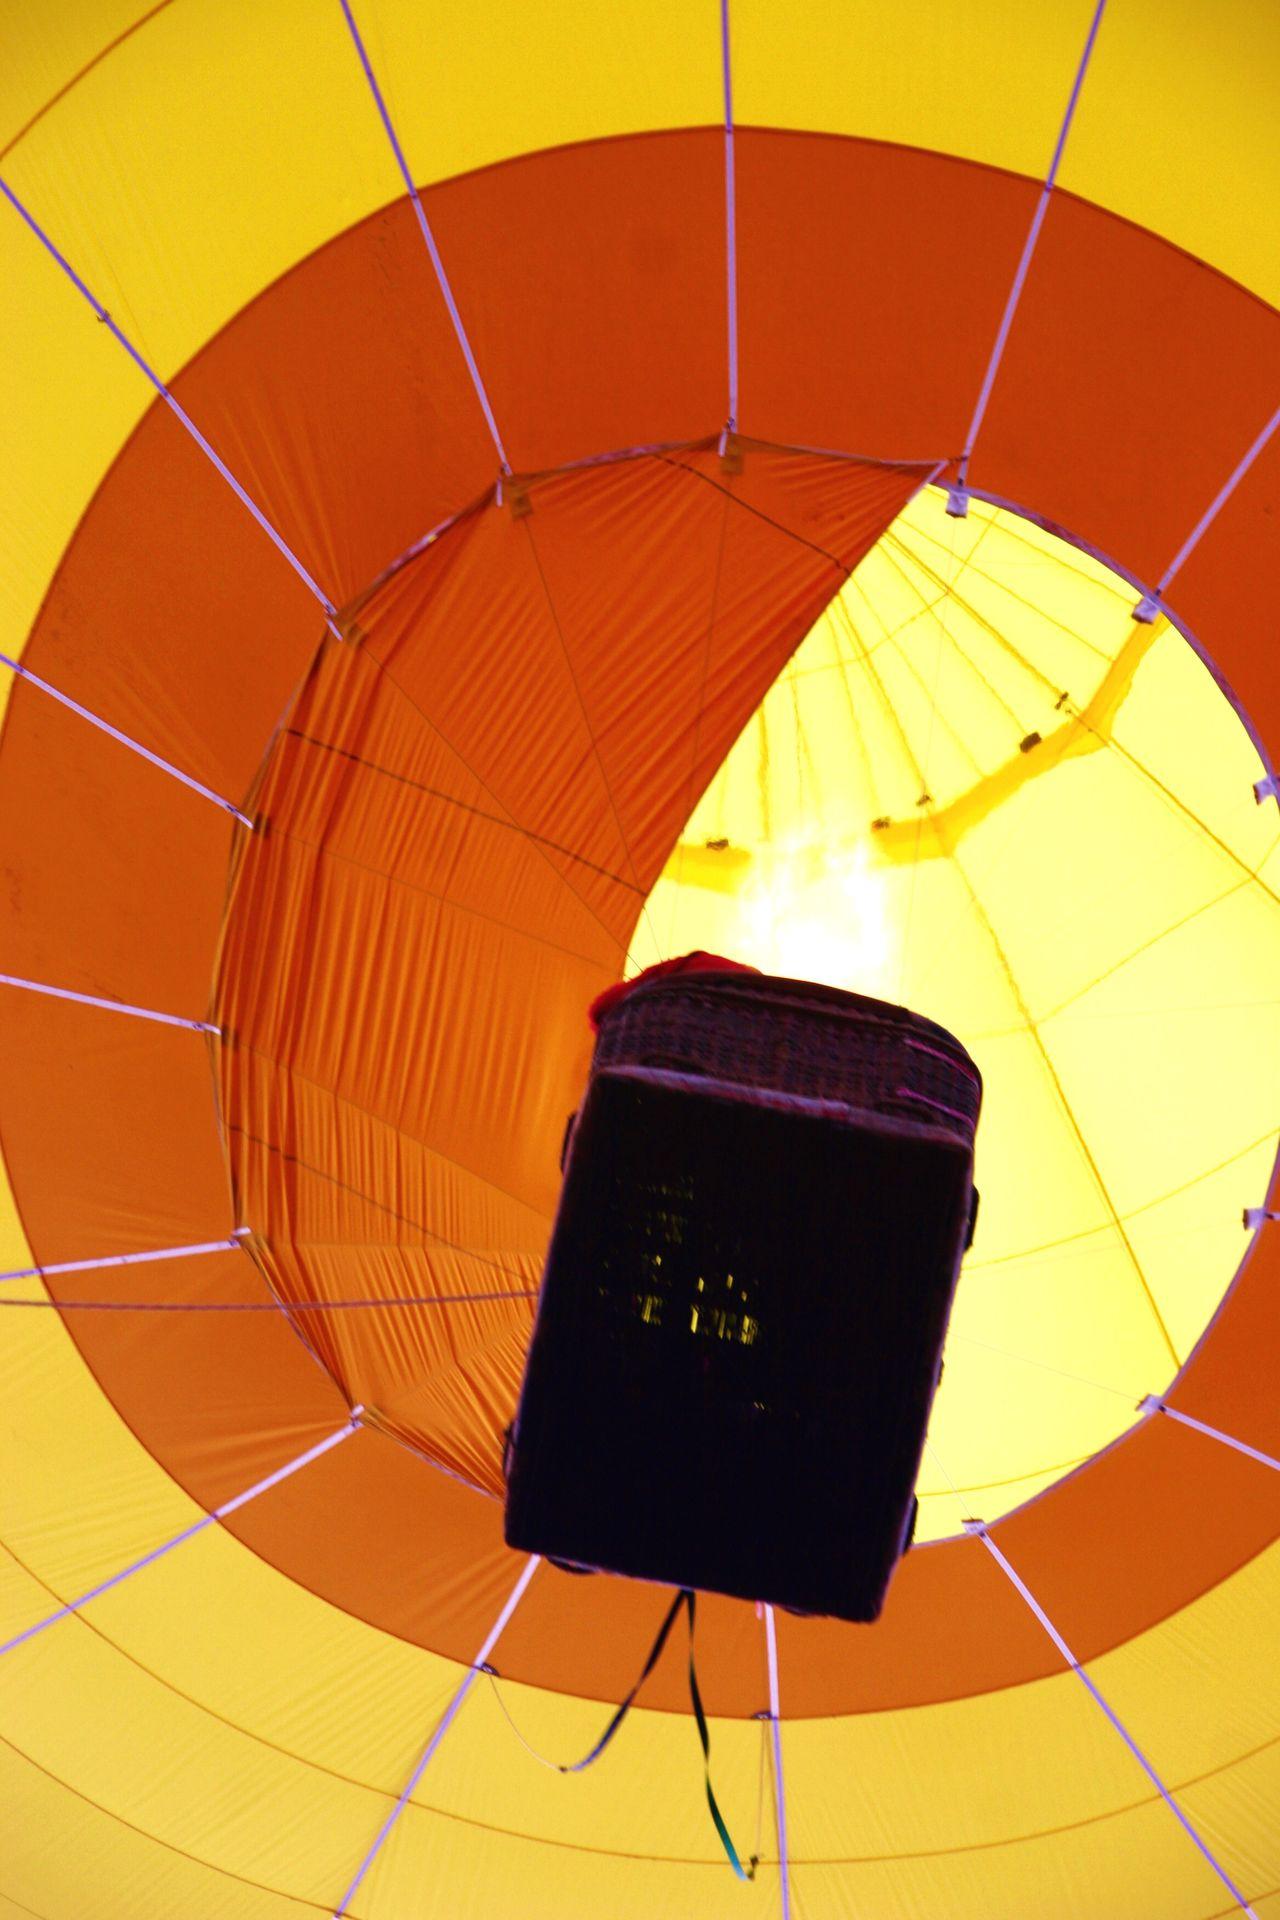 Lemon By Motorola Hot Air Balloons Hot Air Ballooning Ballooning Yellow